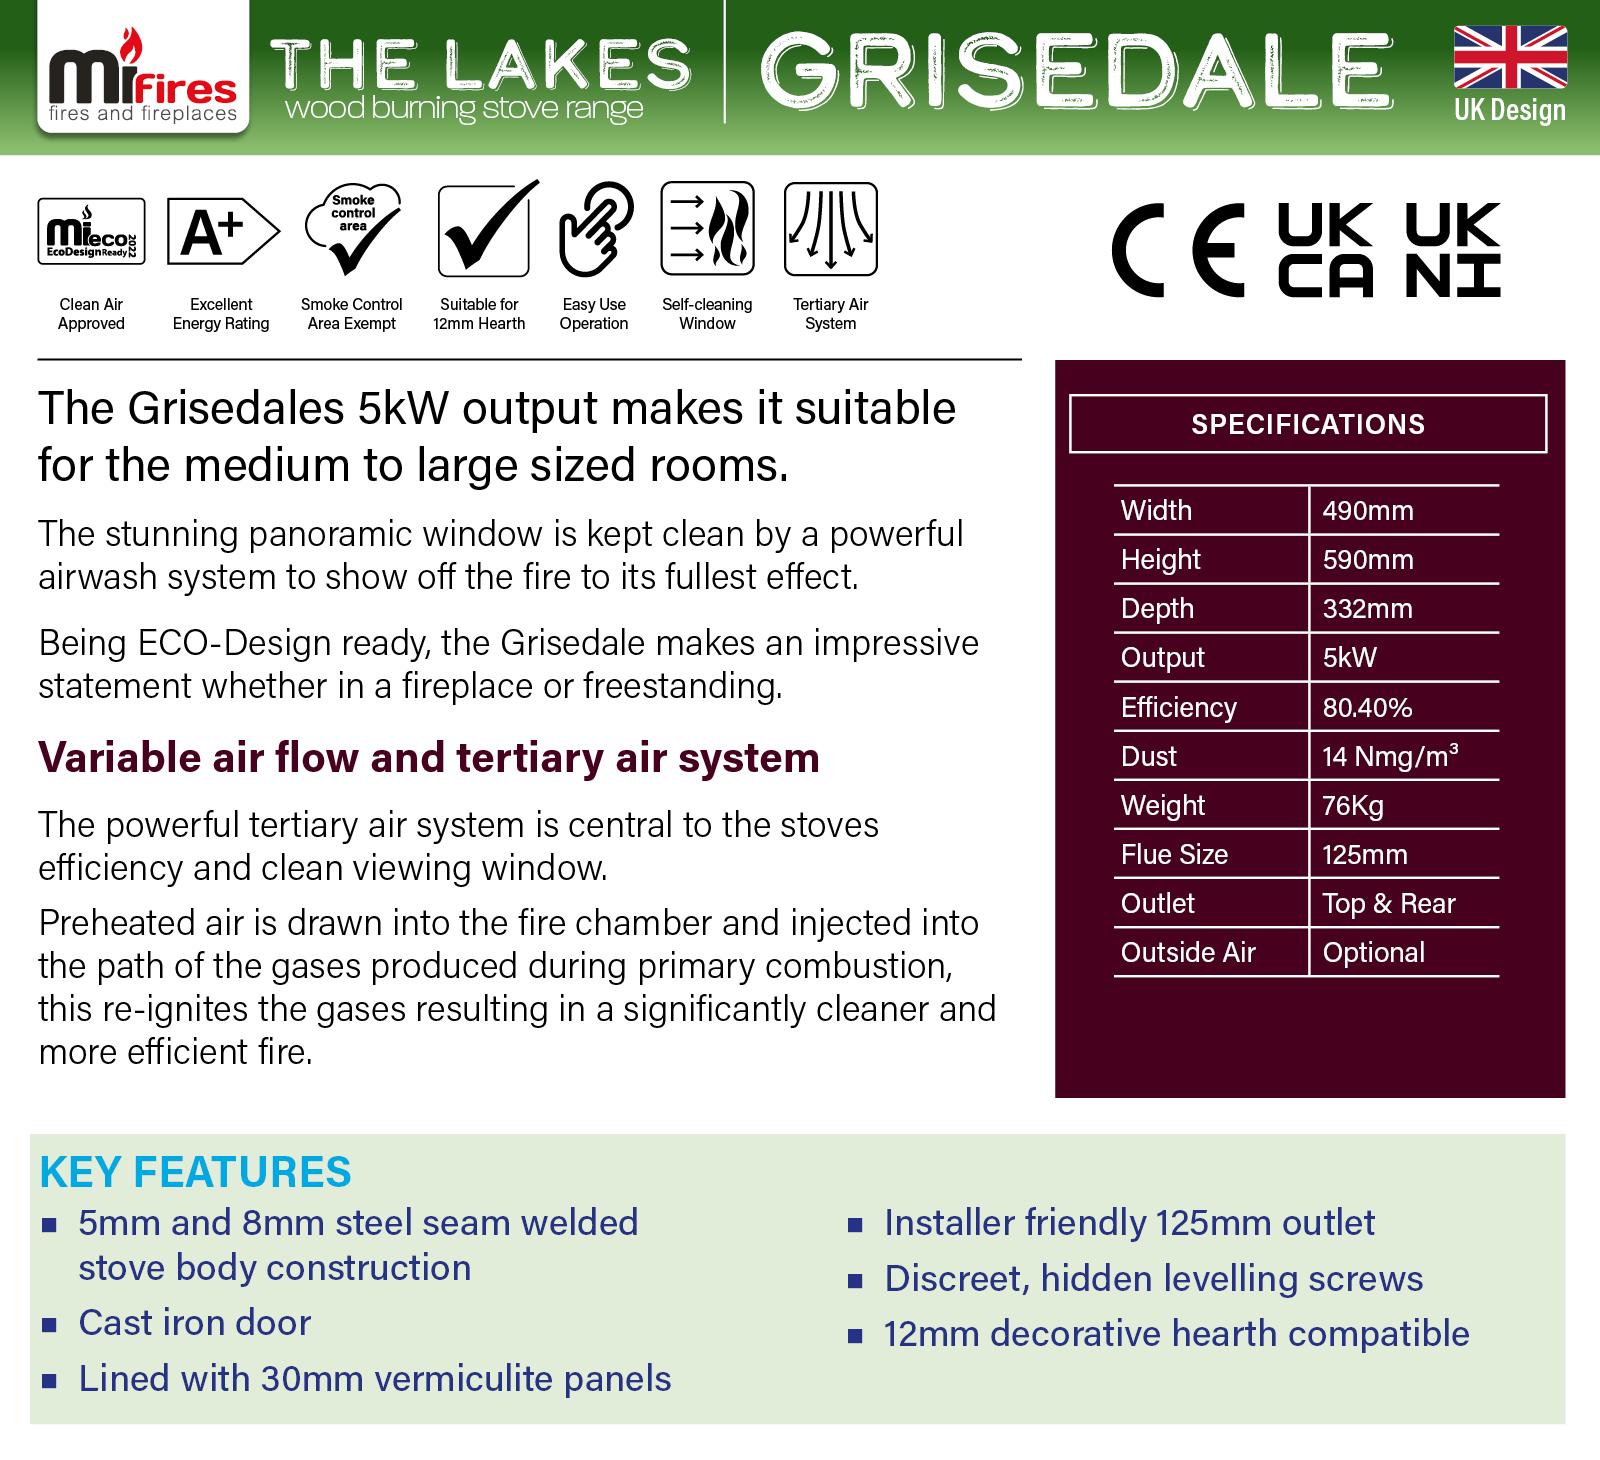 Grisedale